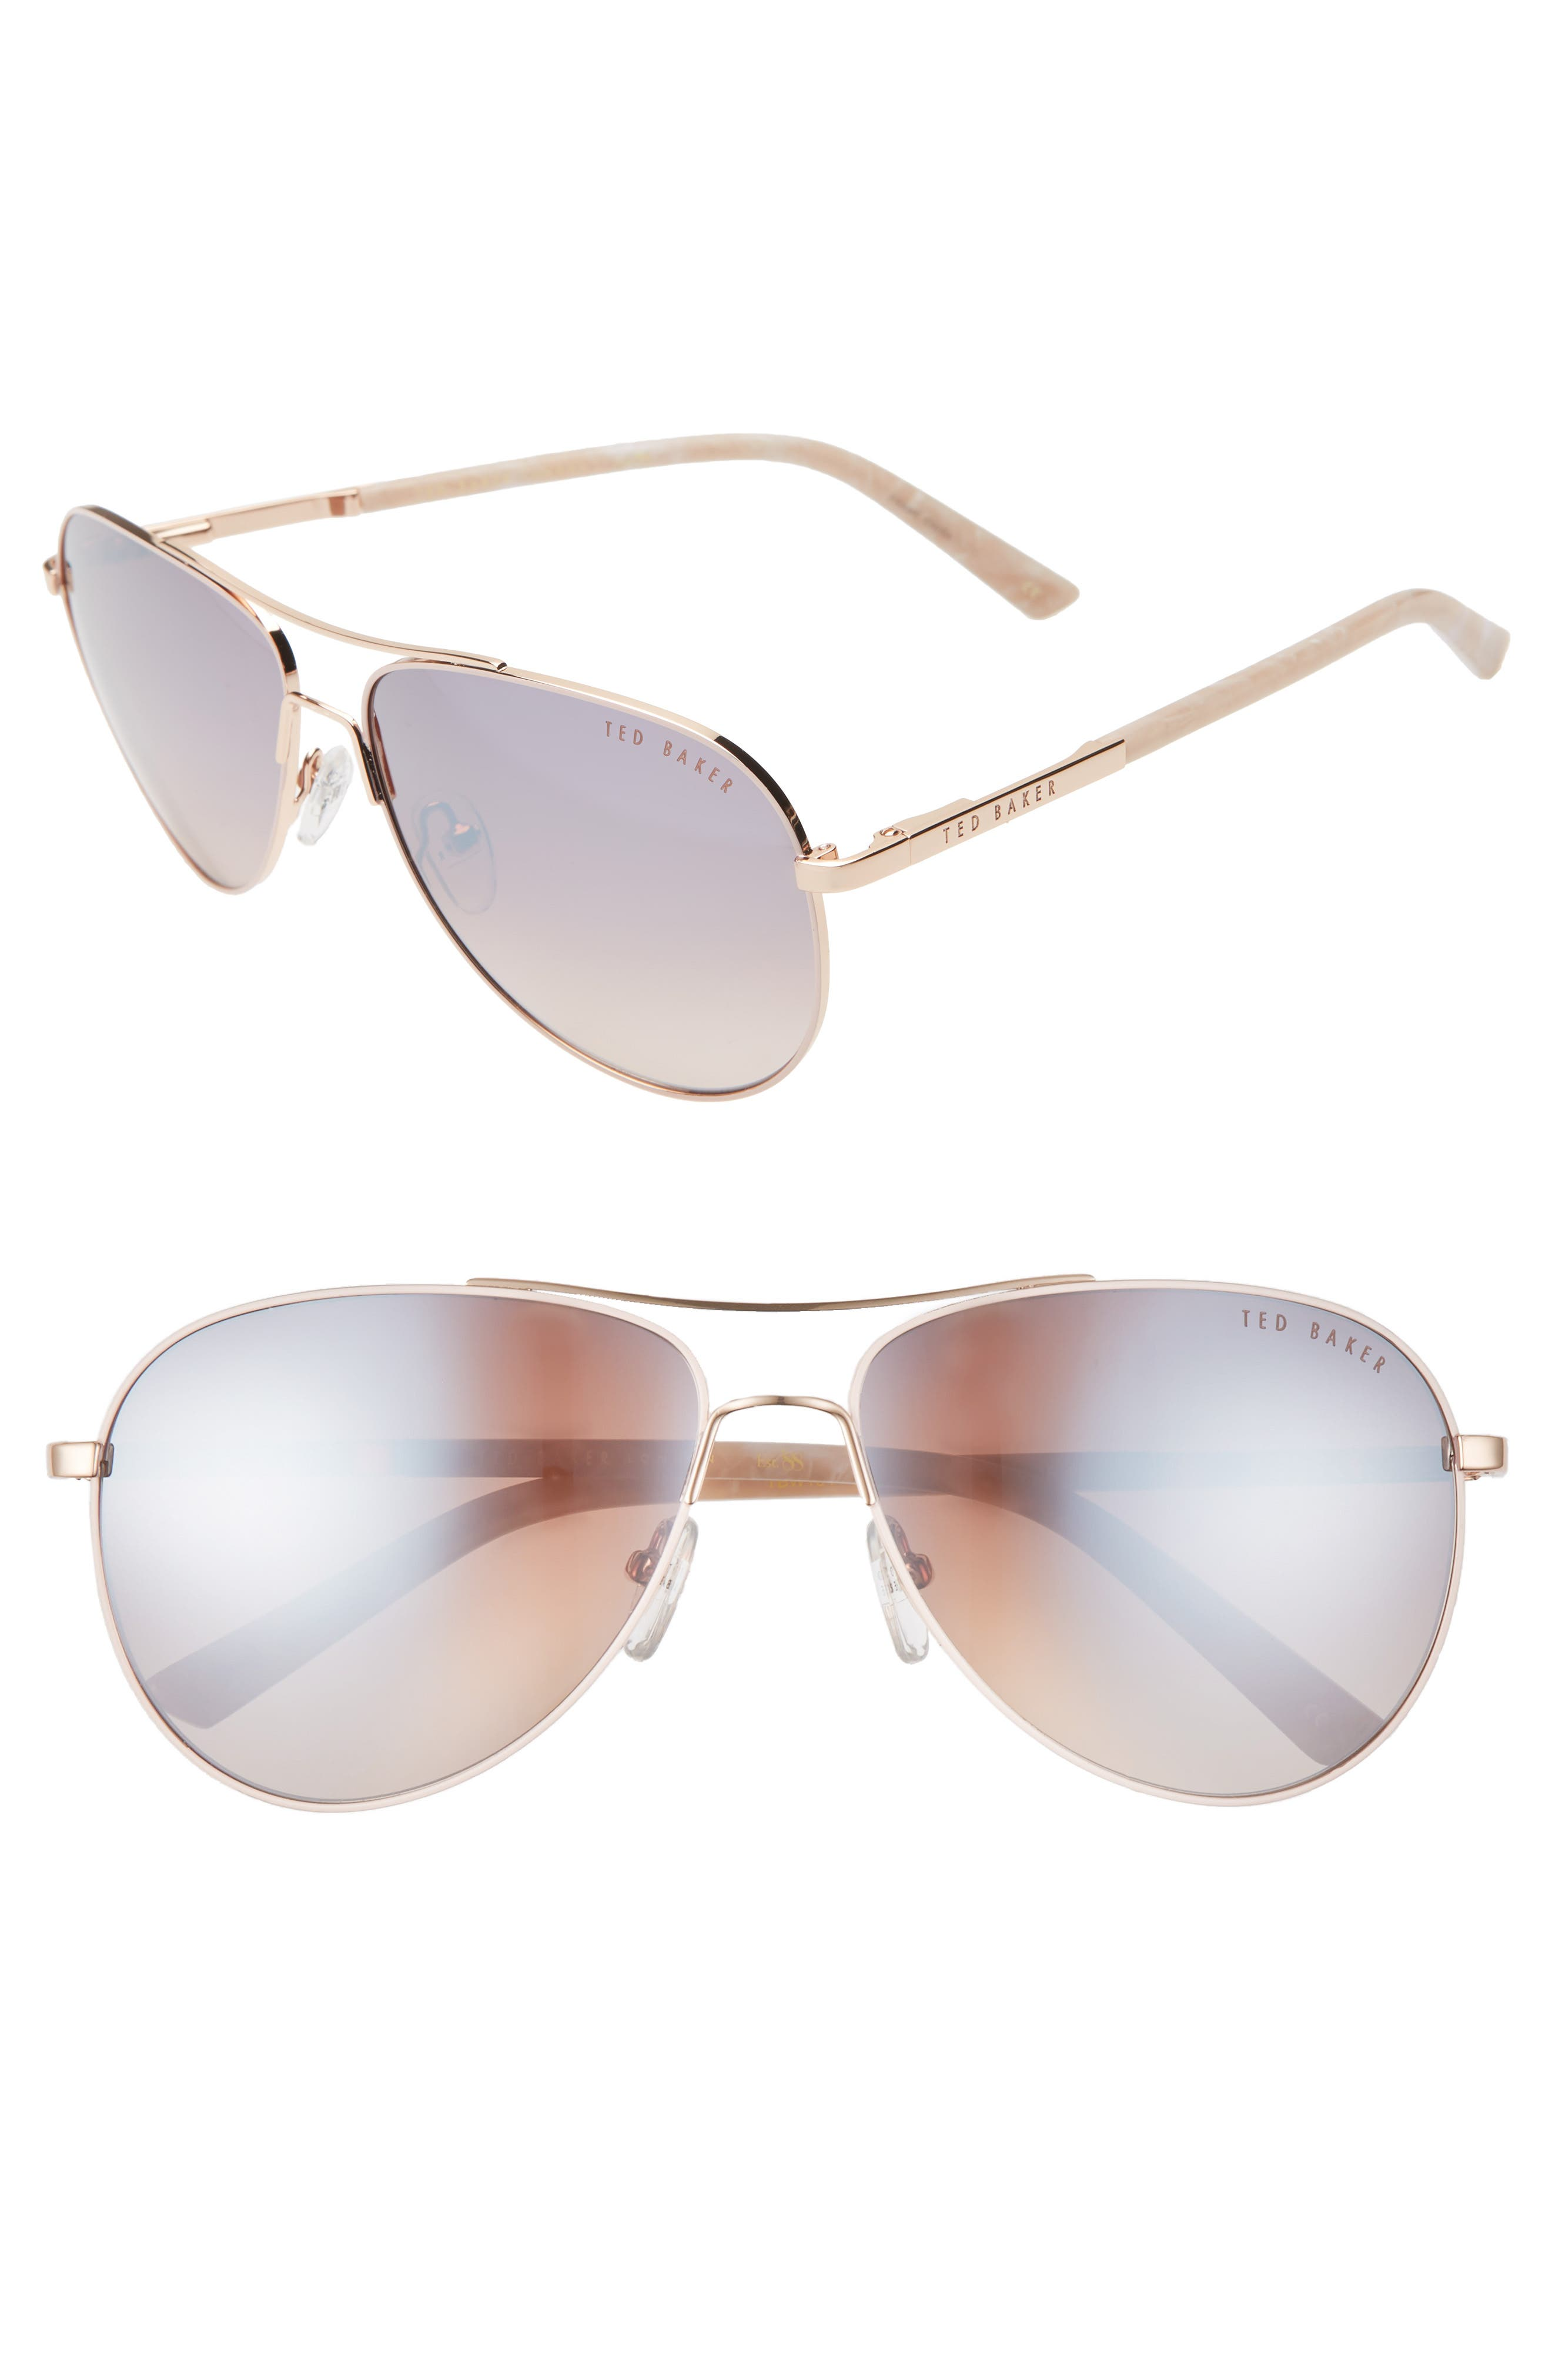 Ted Baker Sunglasses Womens Charlotte Sunglasses